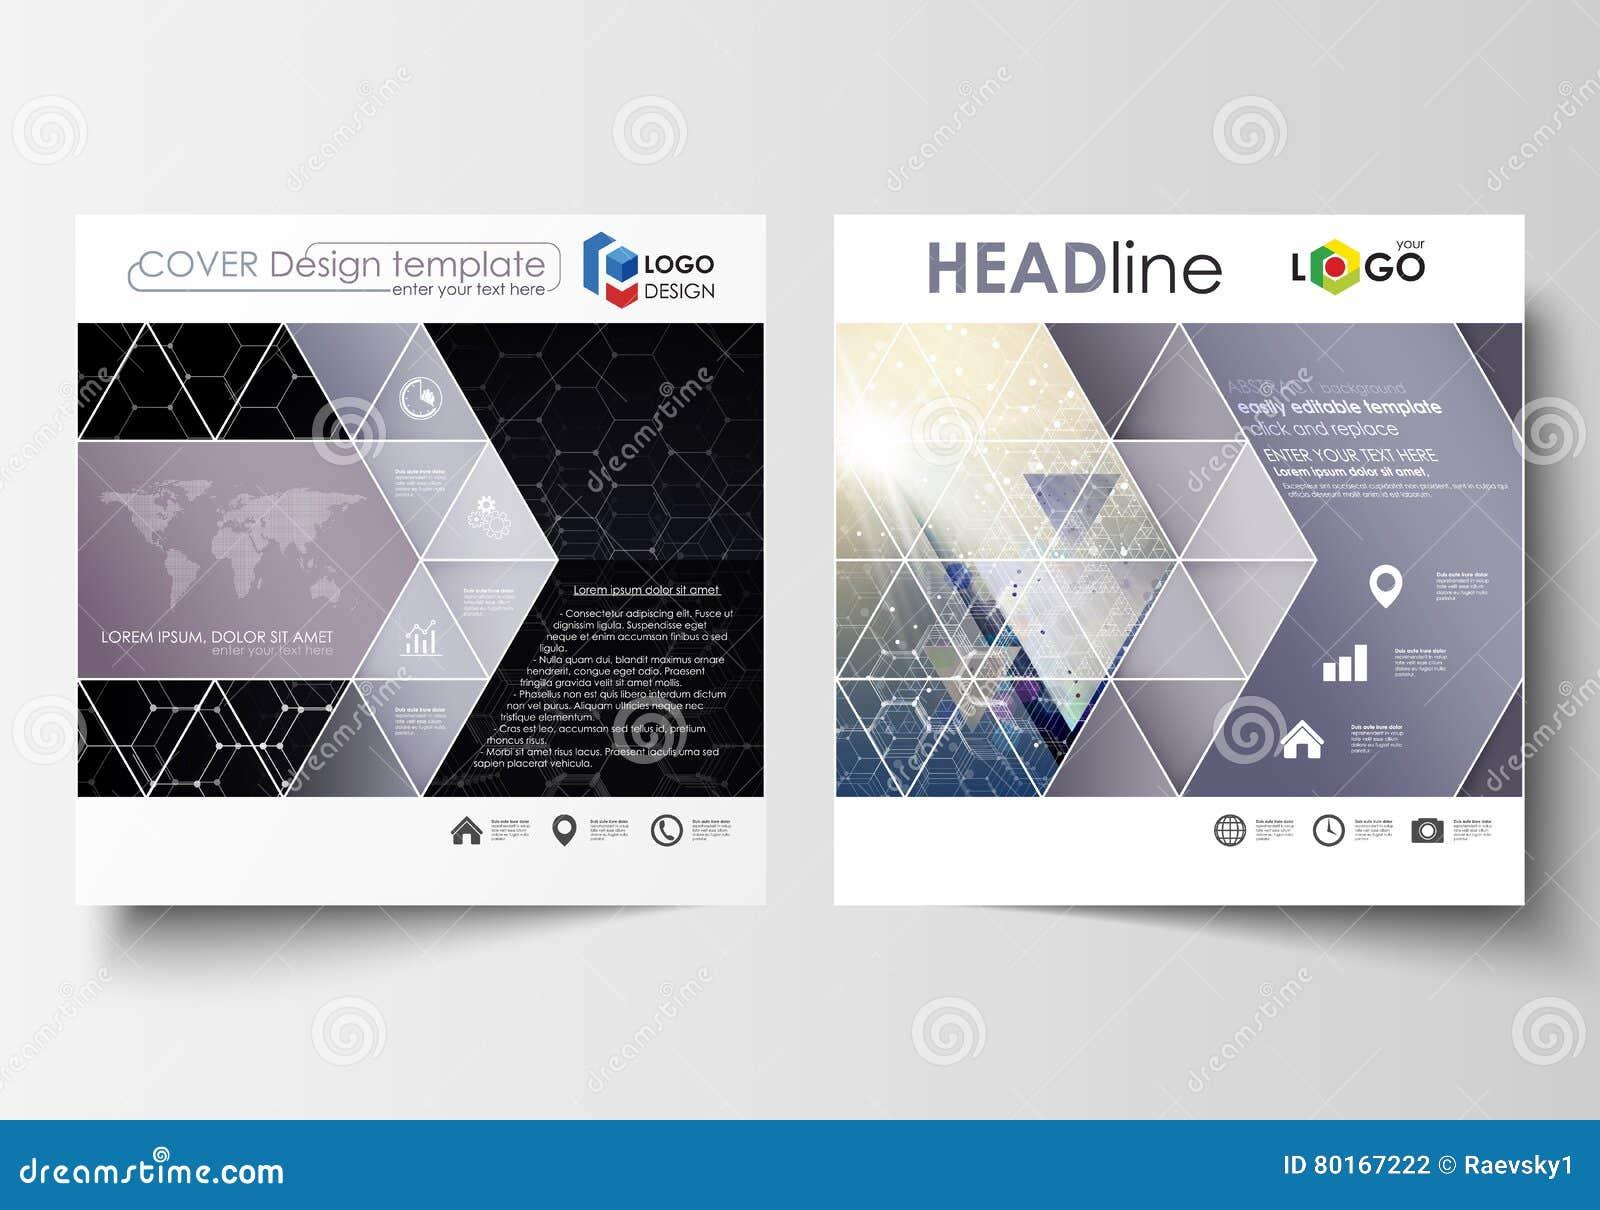 Templates For Square Design Brochure, Magazine, Flyer, Report ...